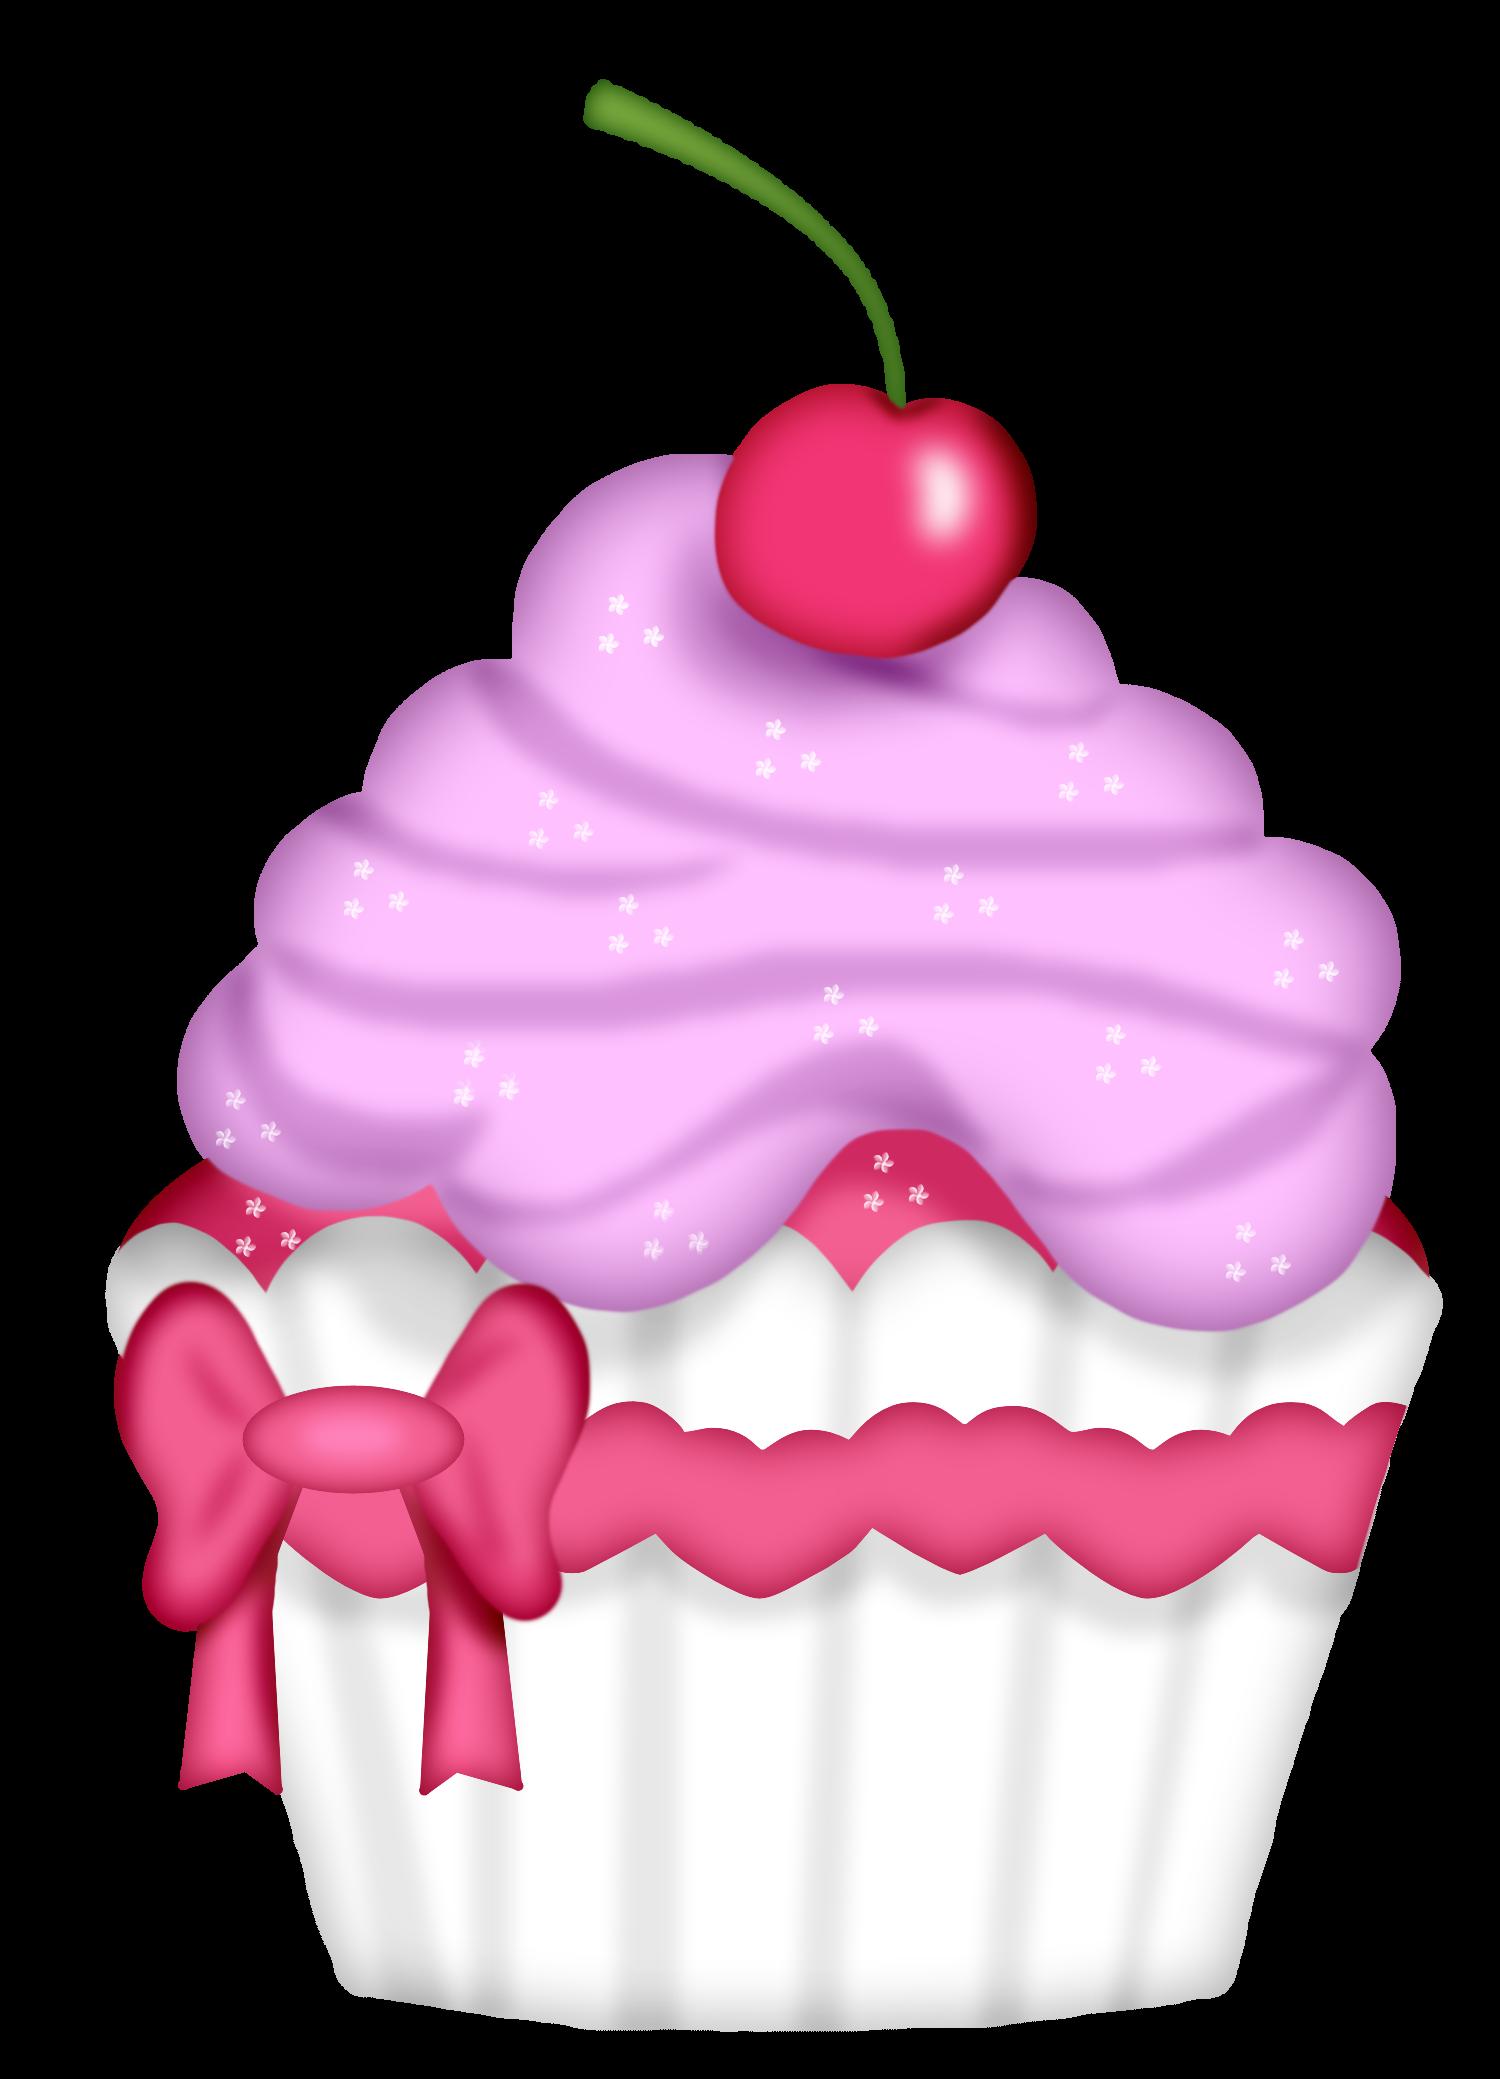 Нарисованная картинка пироженки